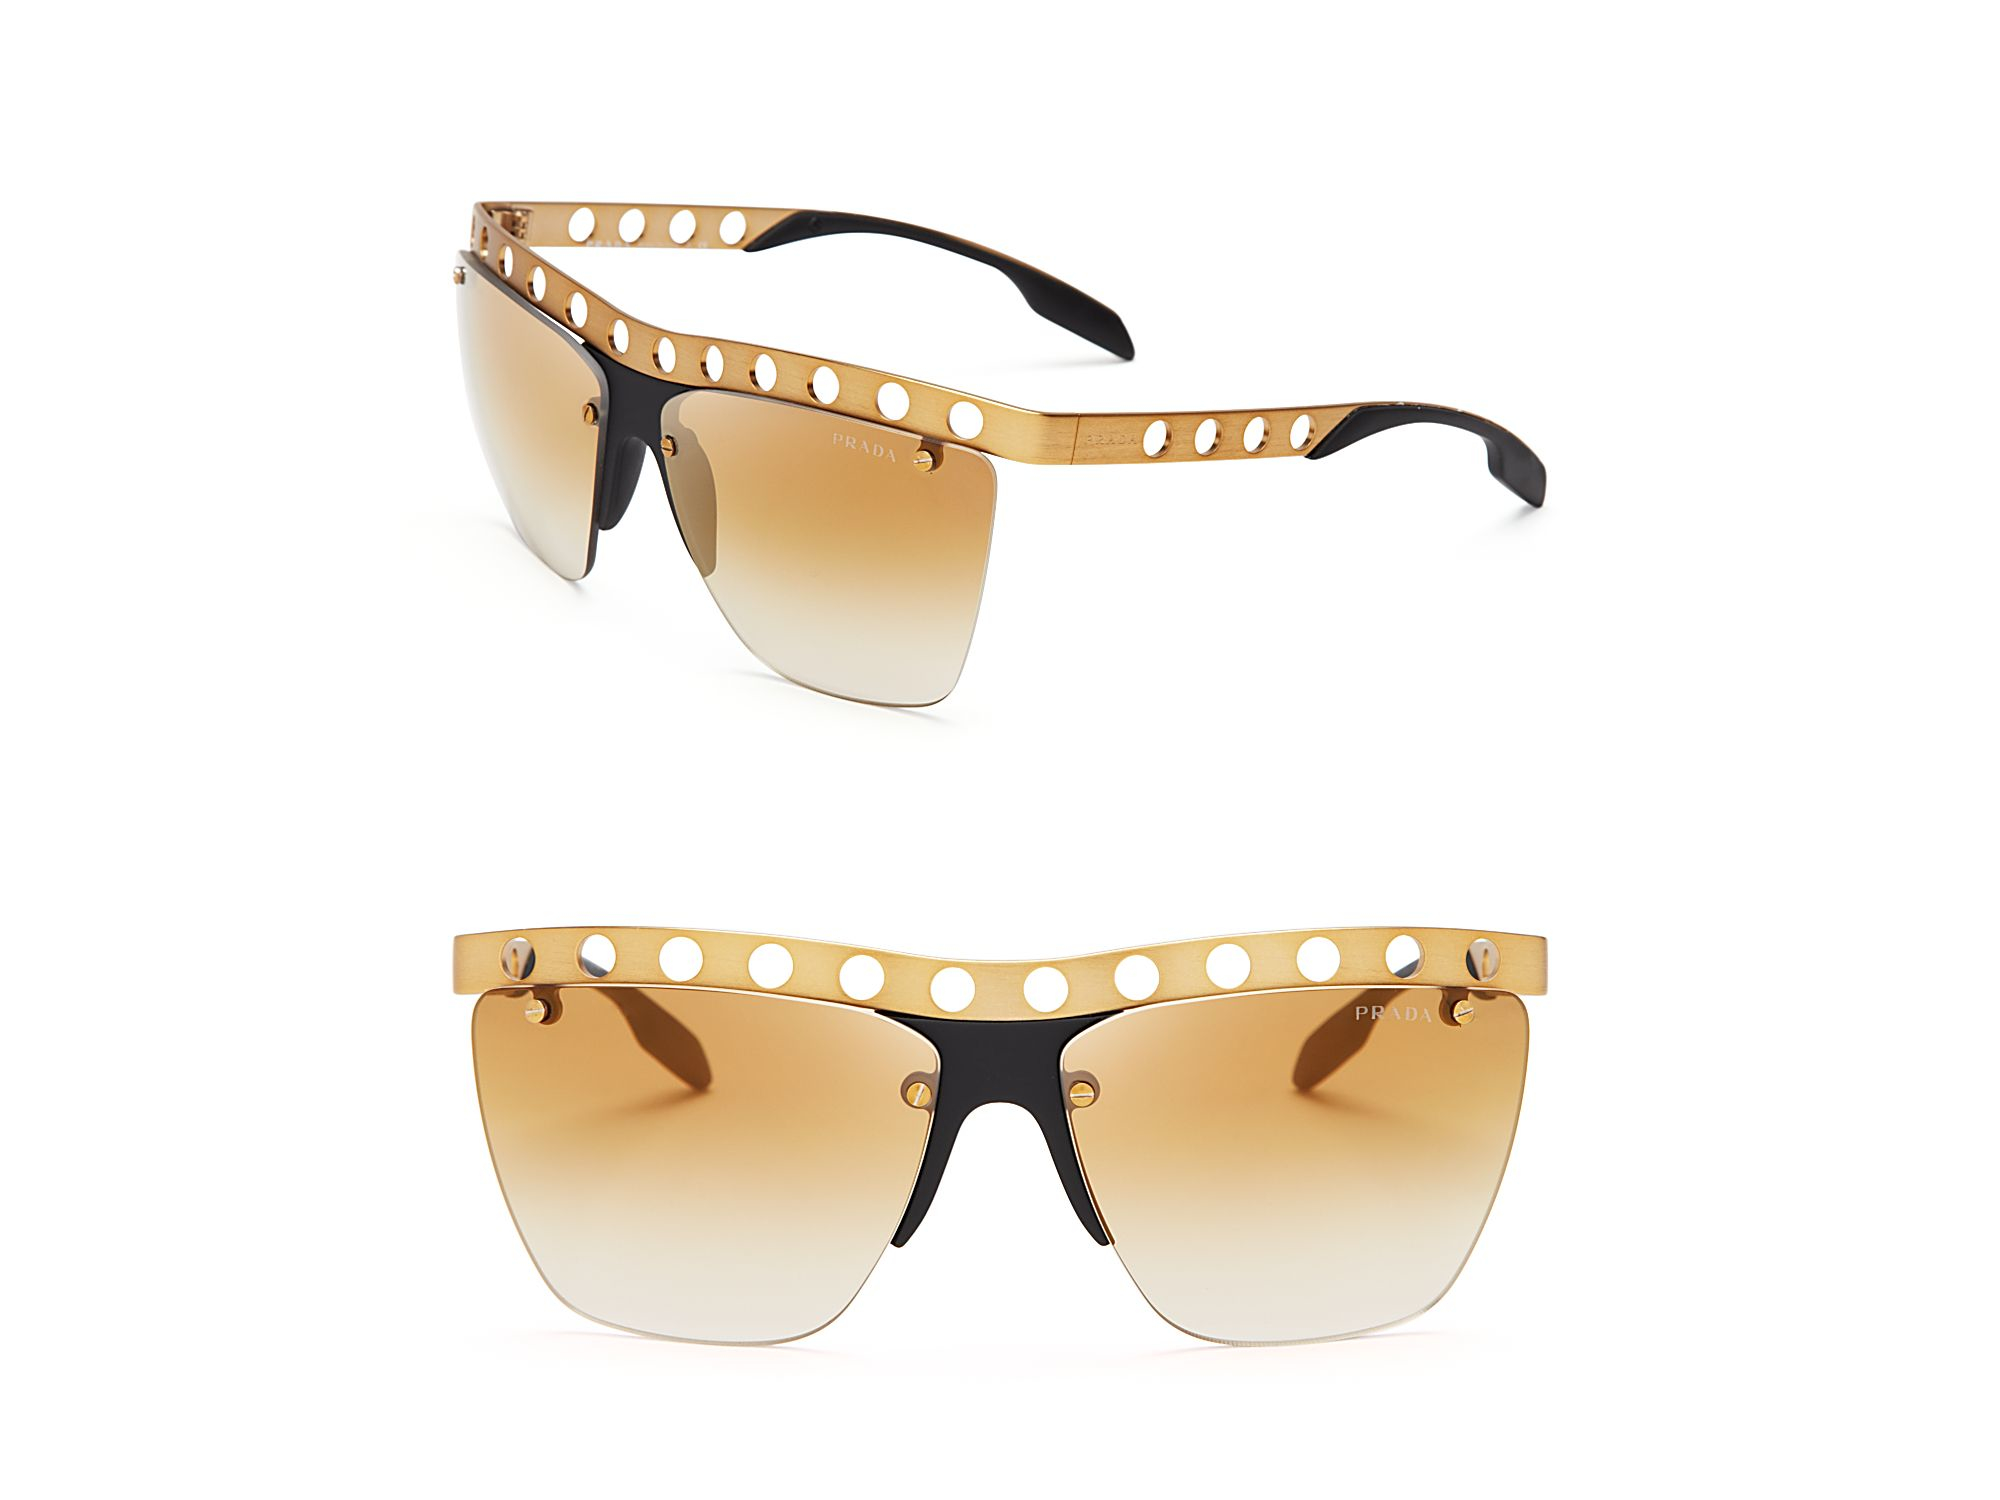 2545eace5ebc Lyst - Prada Perforated Mirrored Wayfarer Sunglasses in Metallic